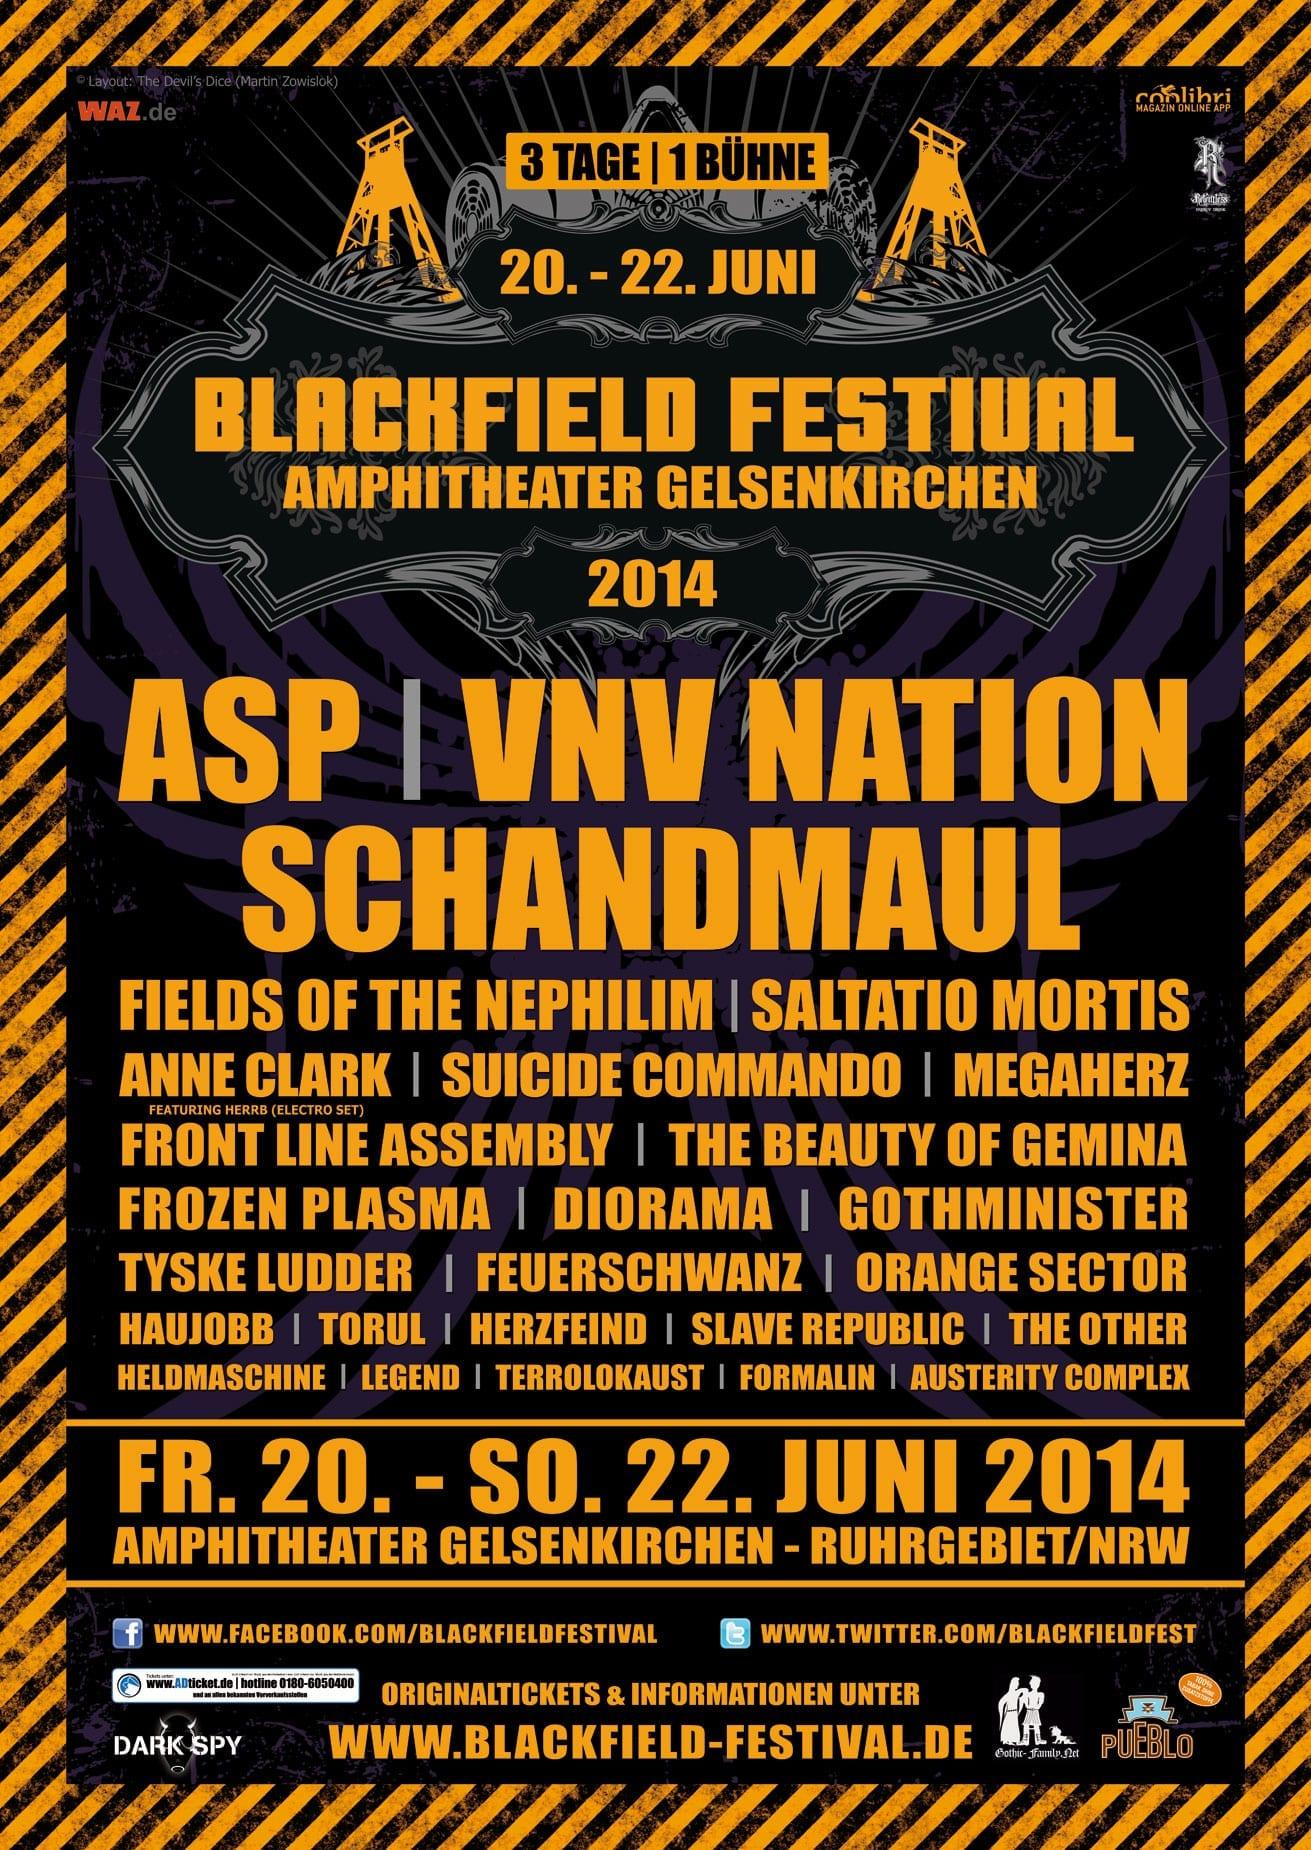 official Flyer: Blackfield Festival 2014